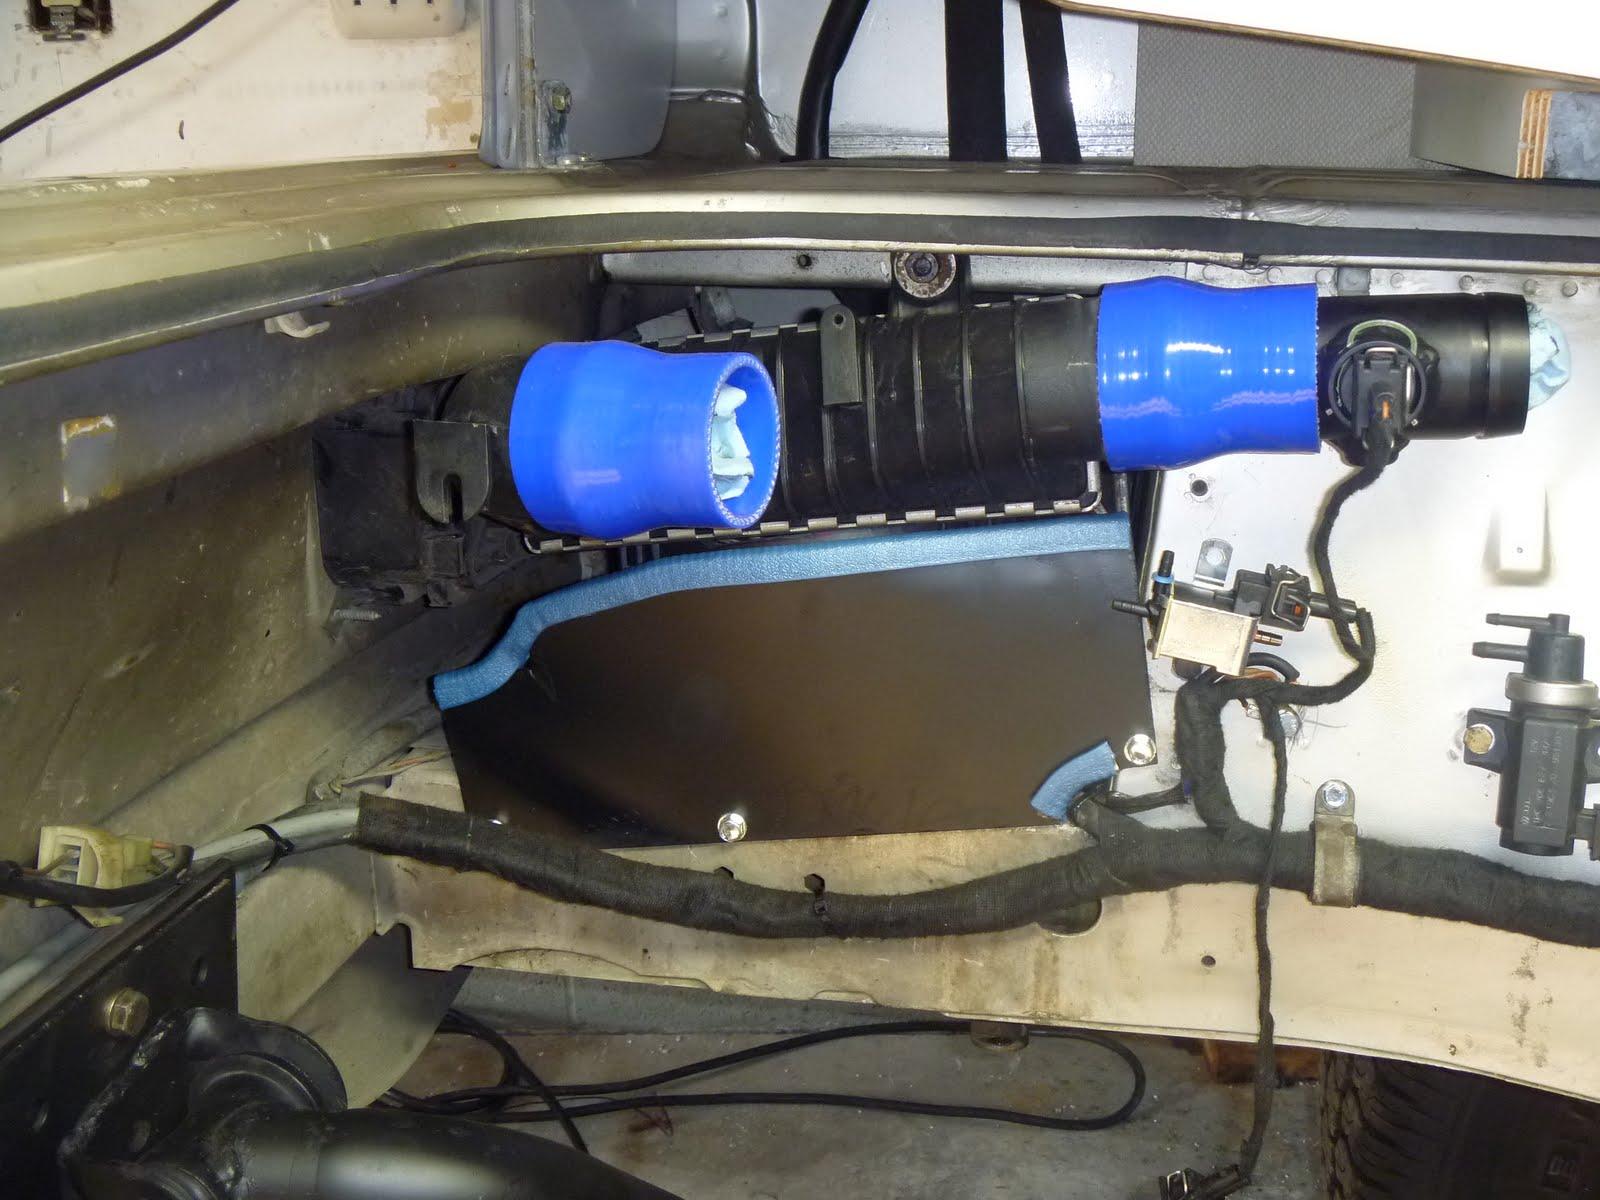 Vanagon Wiring Harness Diagrams A320 Grease Works Shop Notes 87 2wd Tdi Conversion Subaru The Bundle Loom